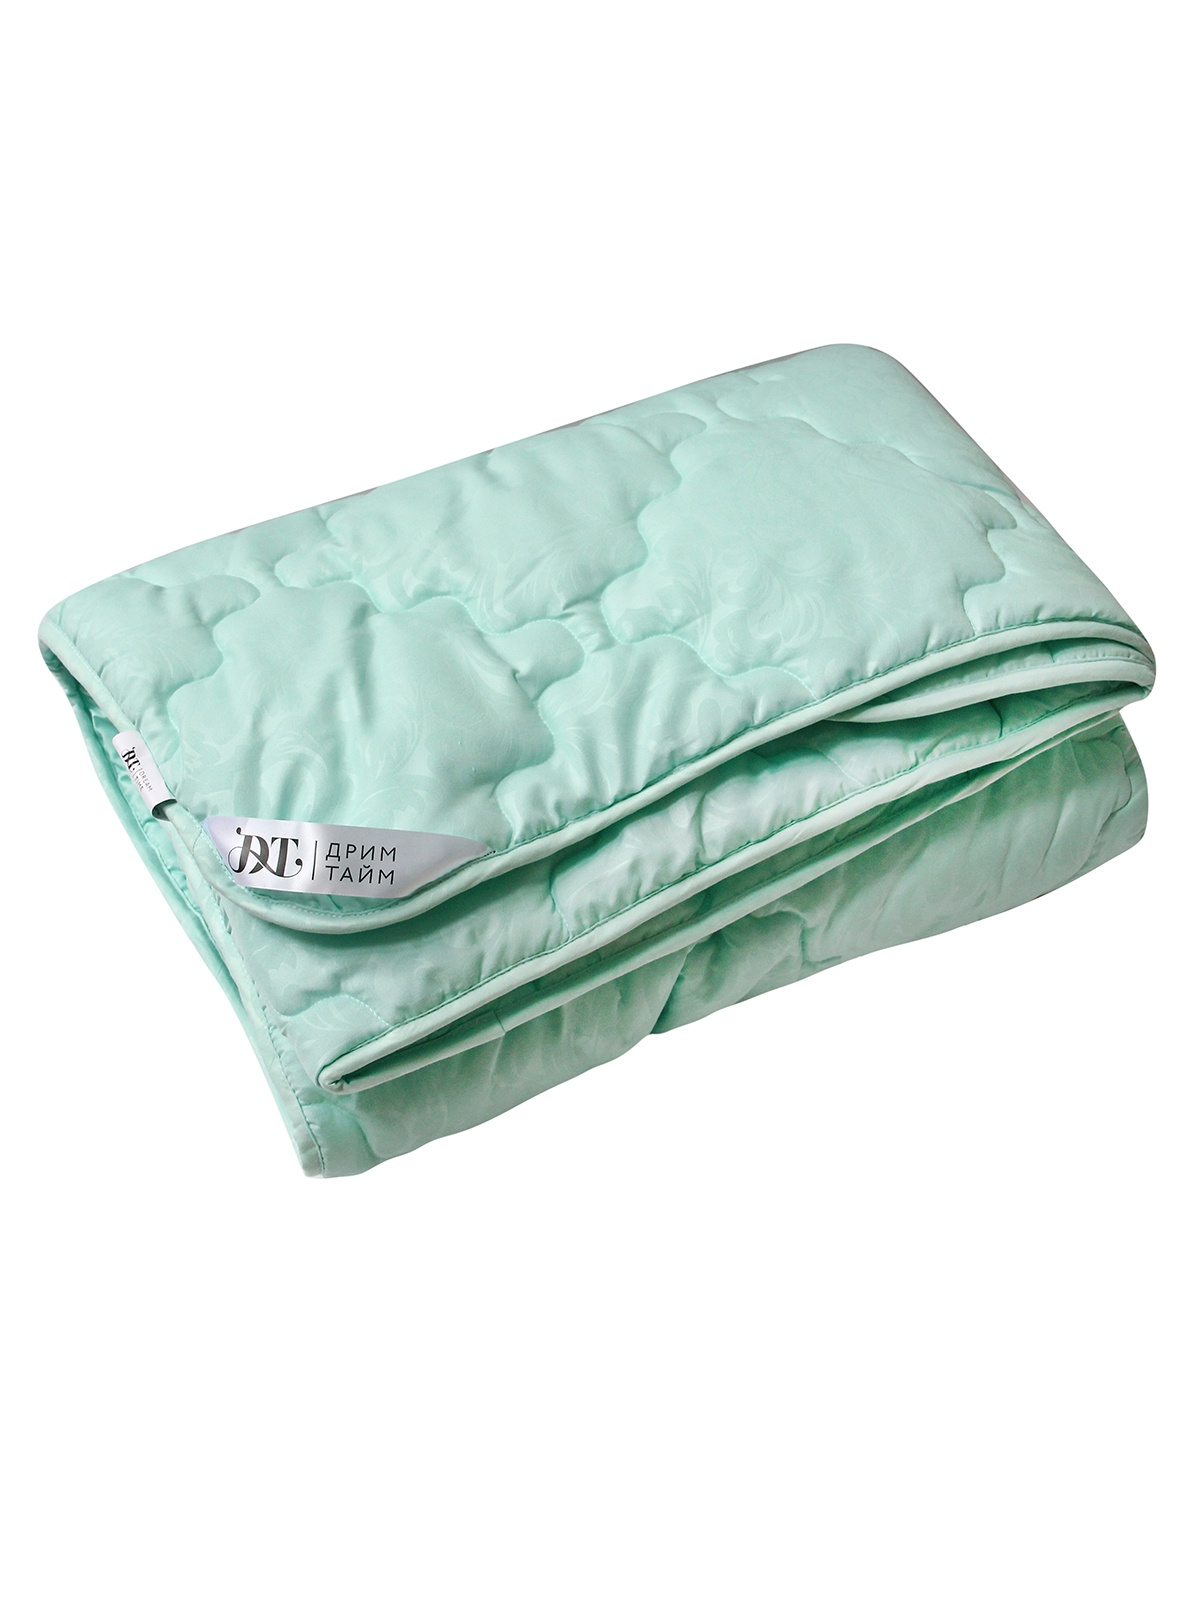 Одеяло Dream Time, ДТ-ОМЭ-20, светло-зеленый, 172 х 205 см одеяло relax wool всесезонное цвет светло бежевый 172 х 205 см